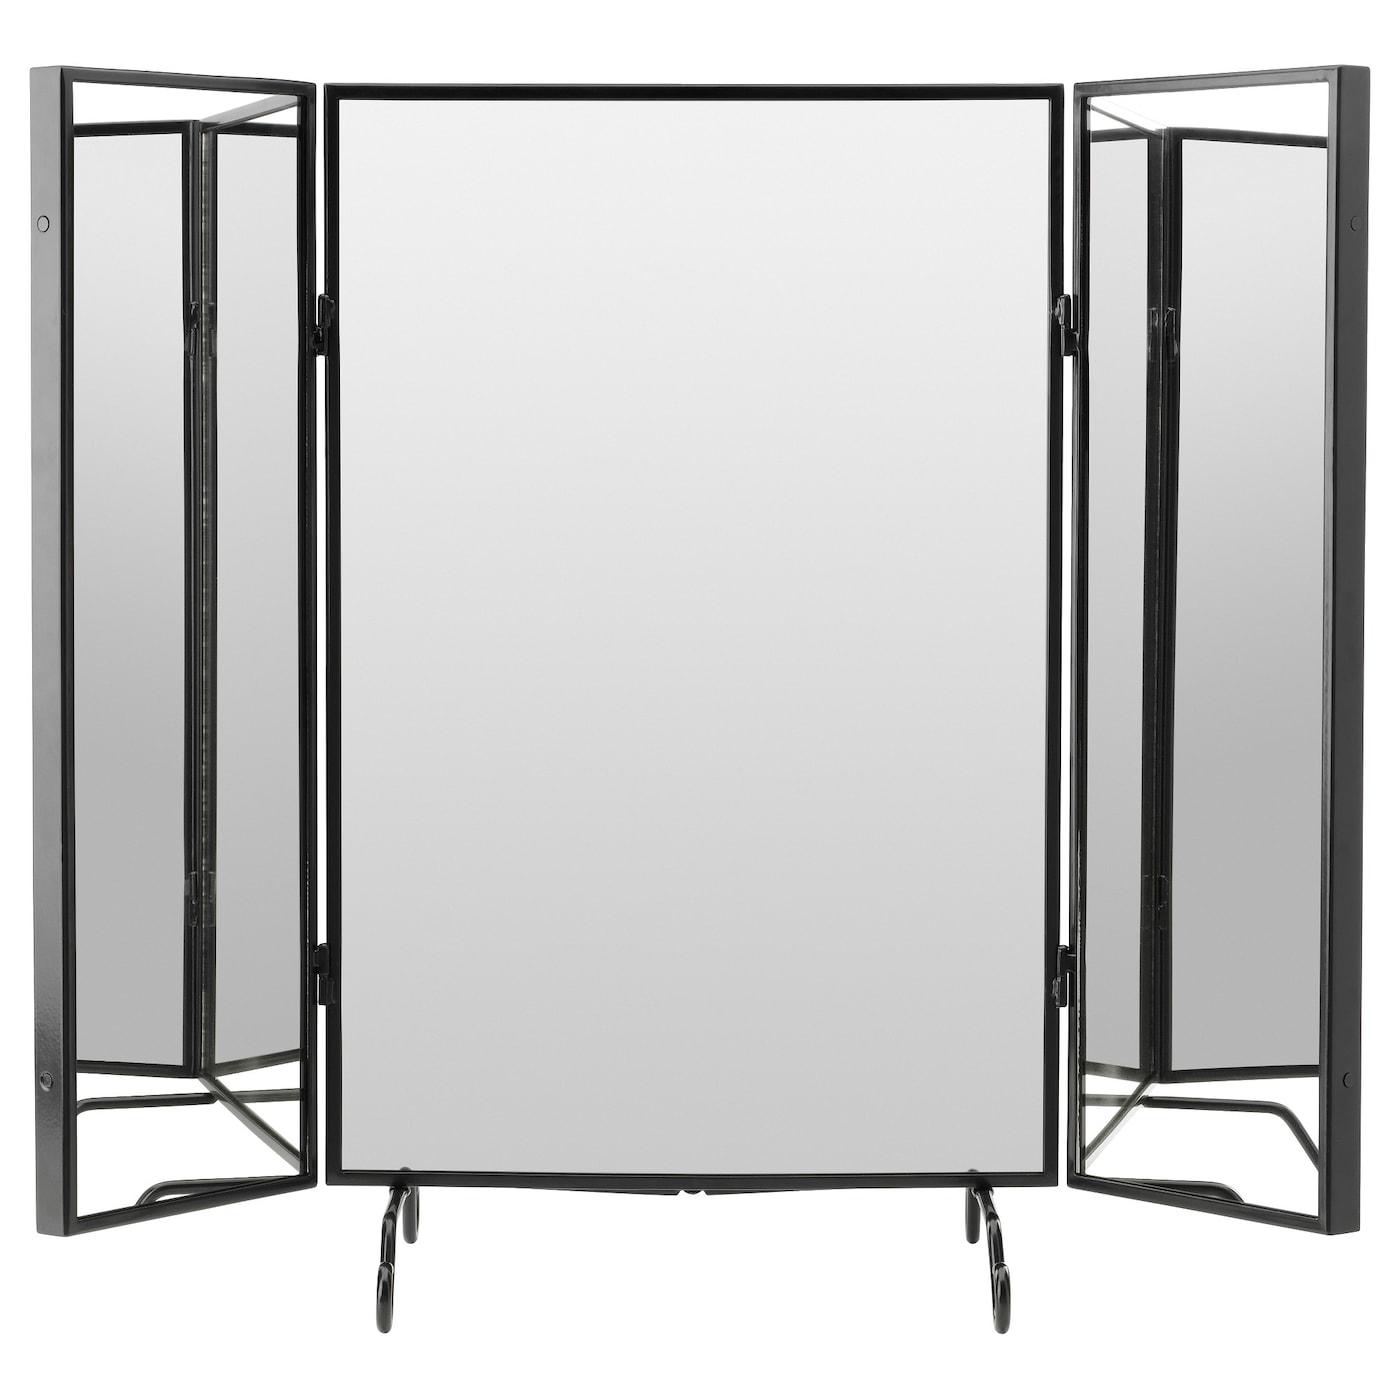 Karmsund table mirror black 80x74 cm ikea - Table angle ikea ...